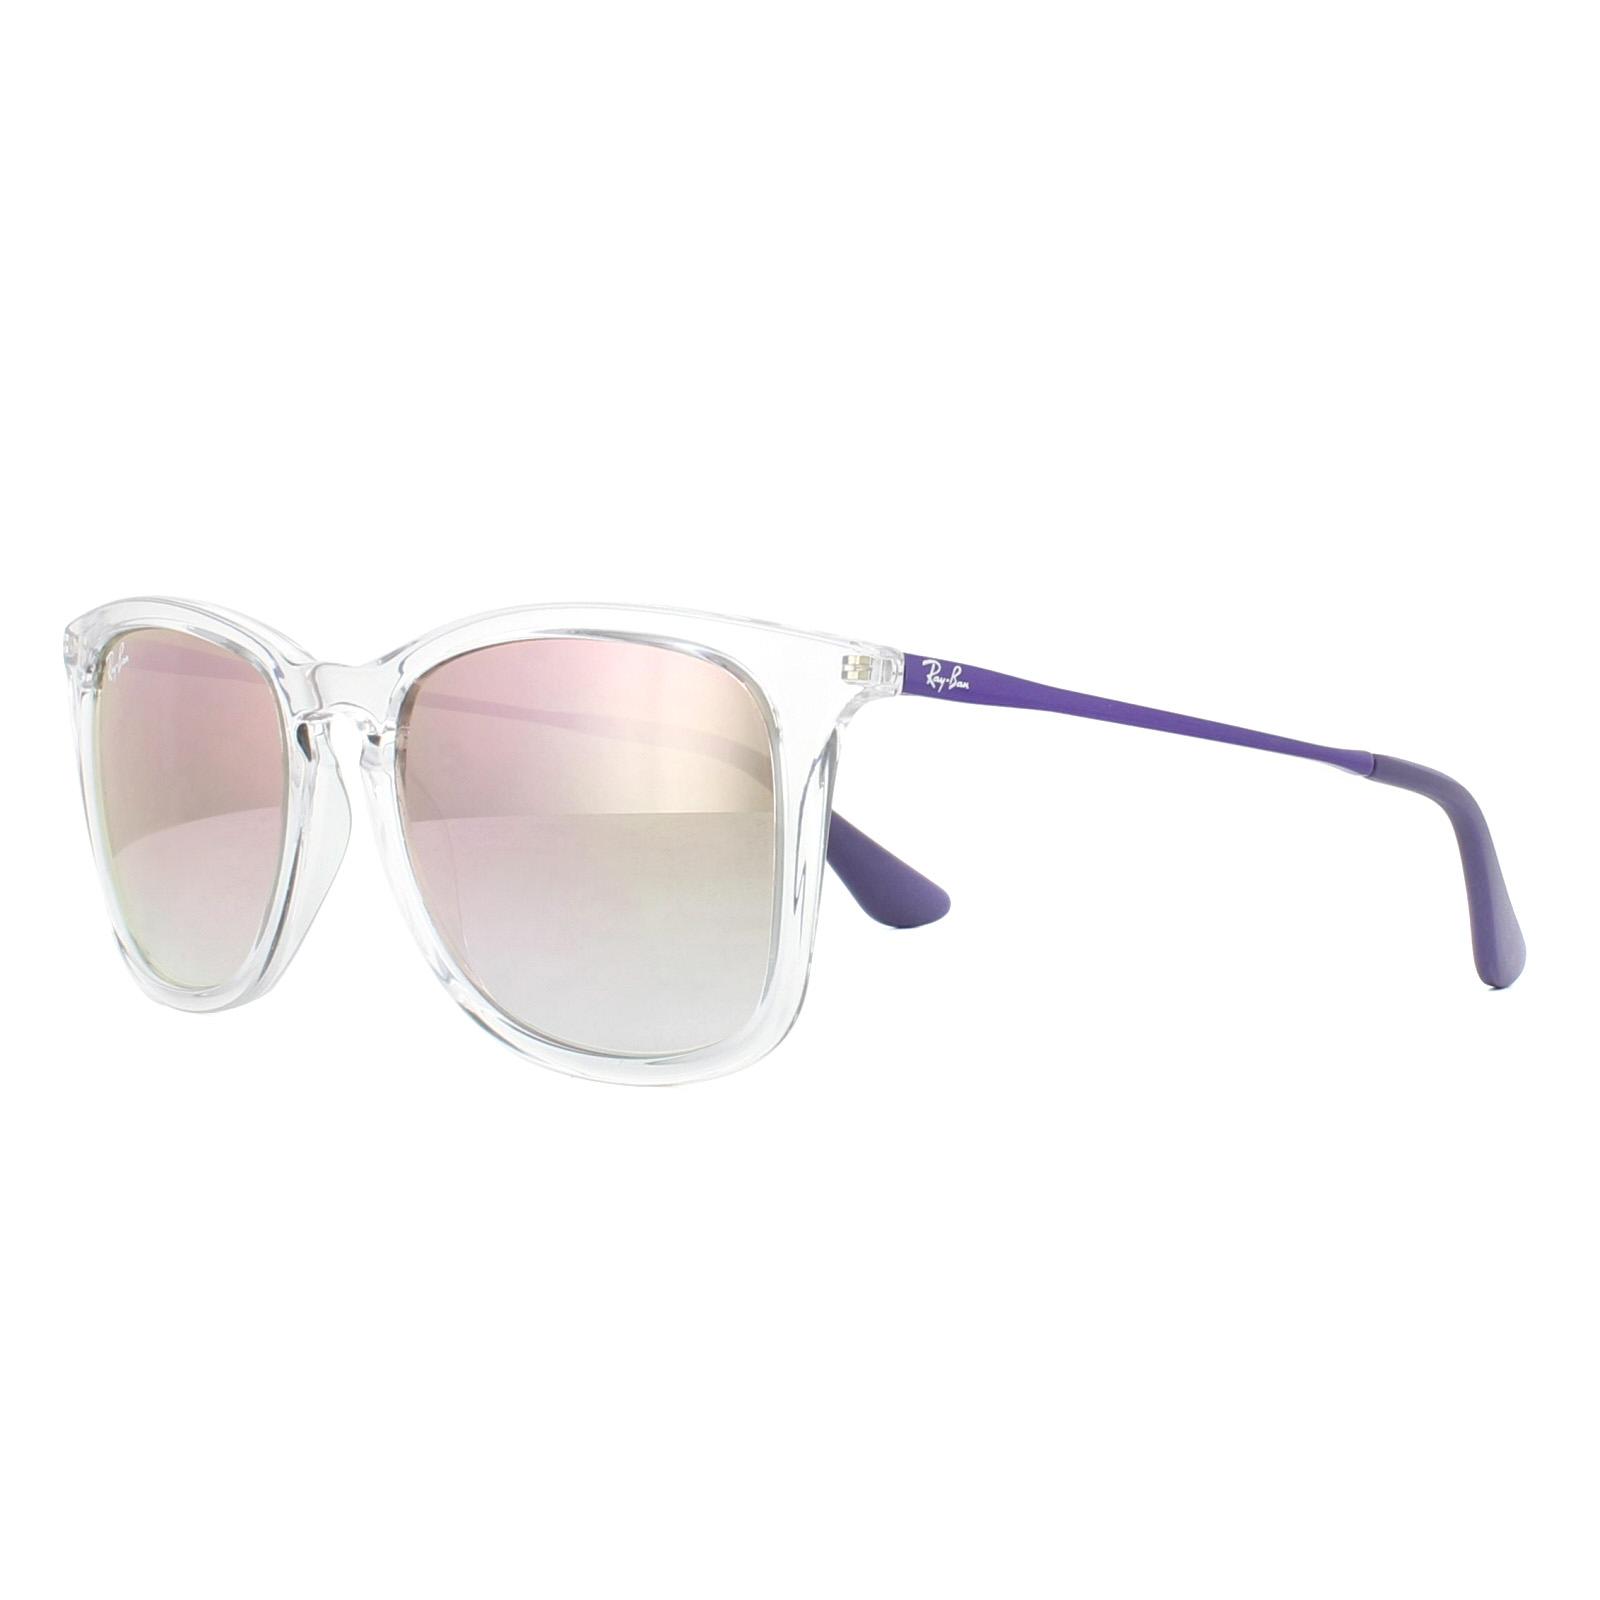 659116d8ccb Sentinel Ray-Ban Junior Sunglasses 9063S 7030B9 Clear VIolet Copper Gradient  Mirror